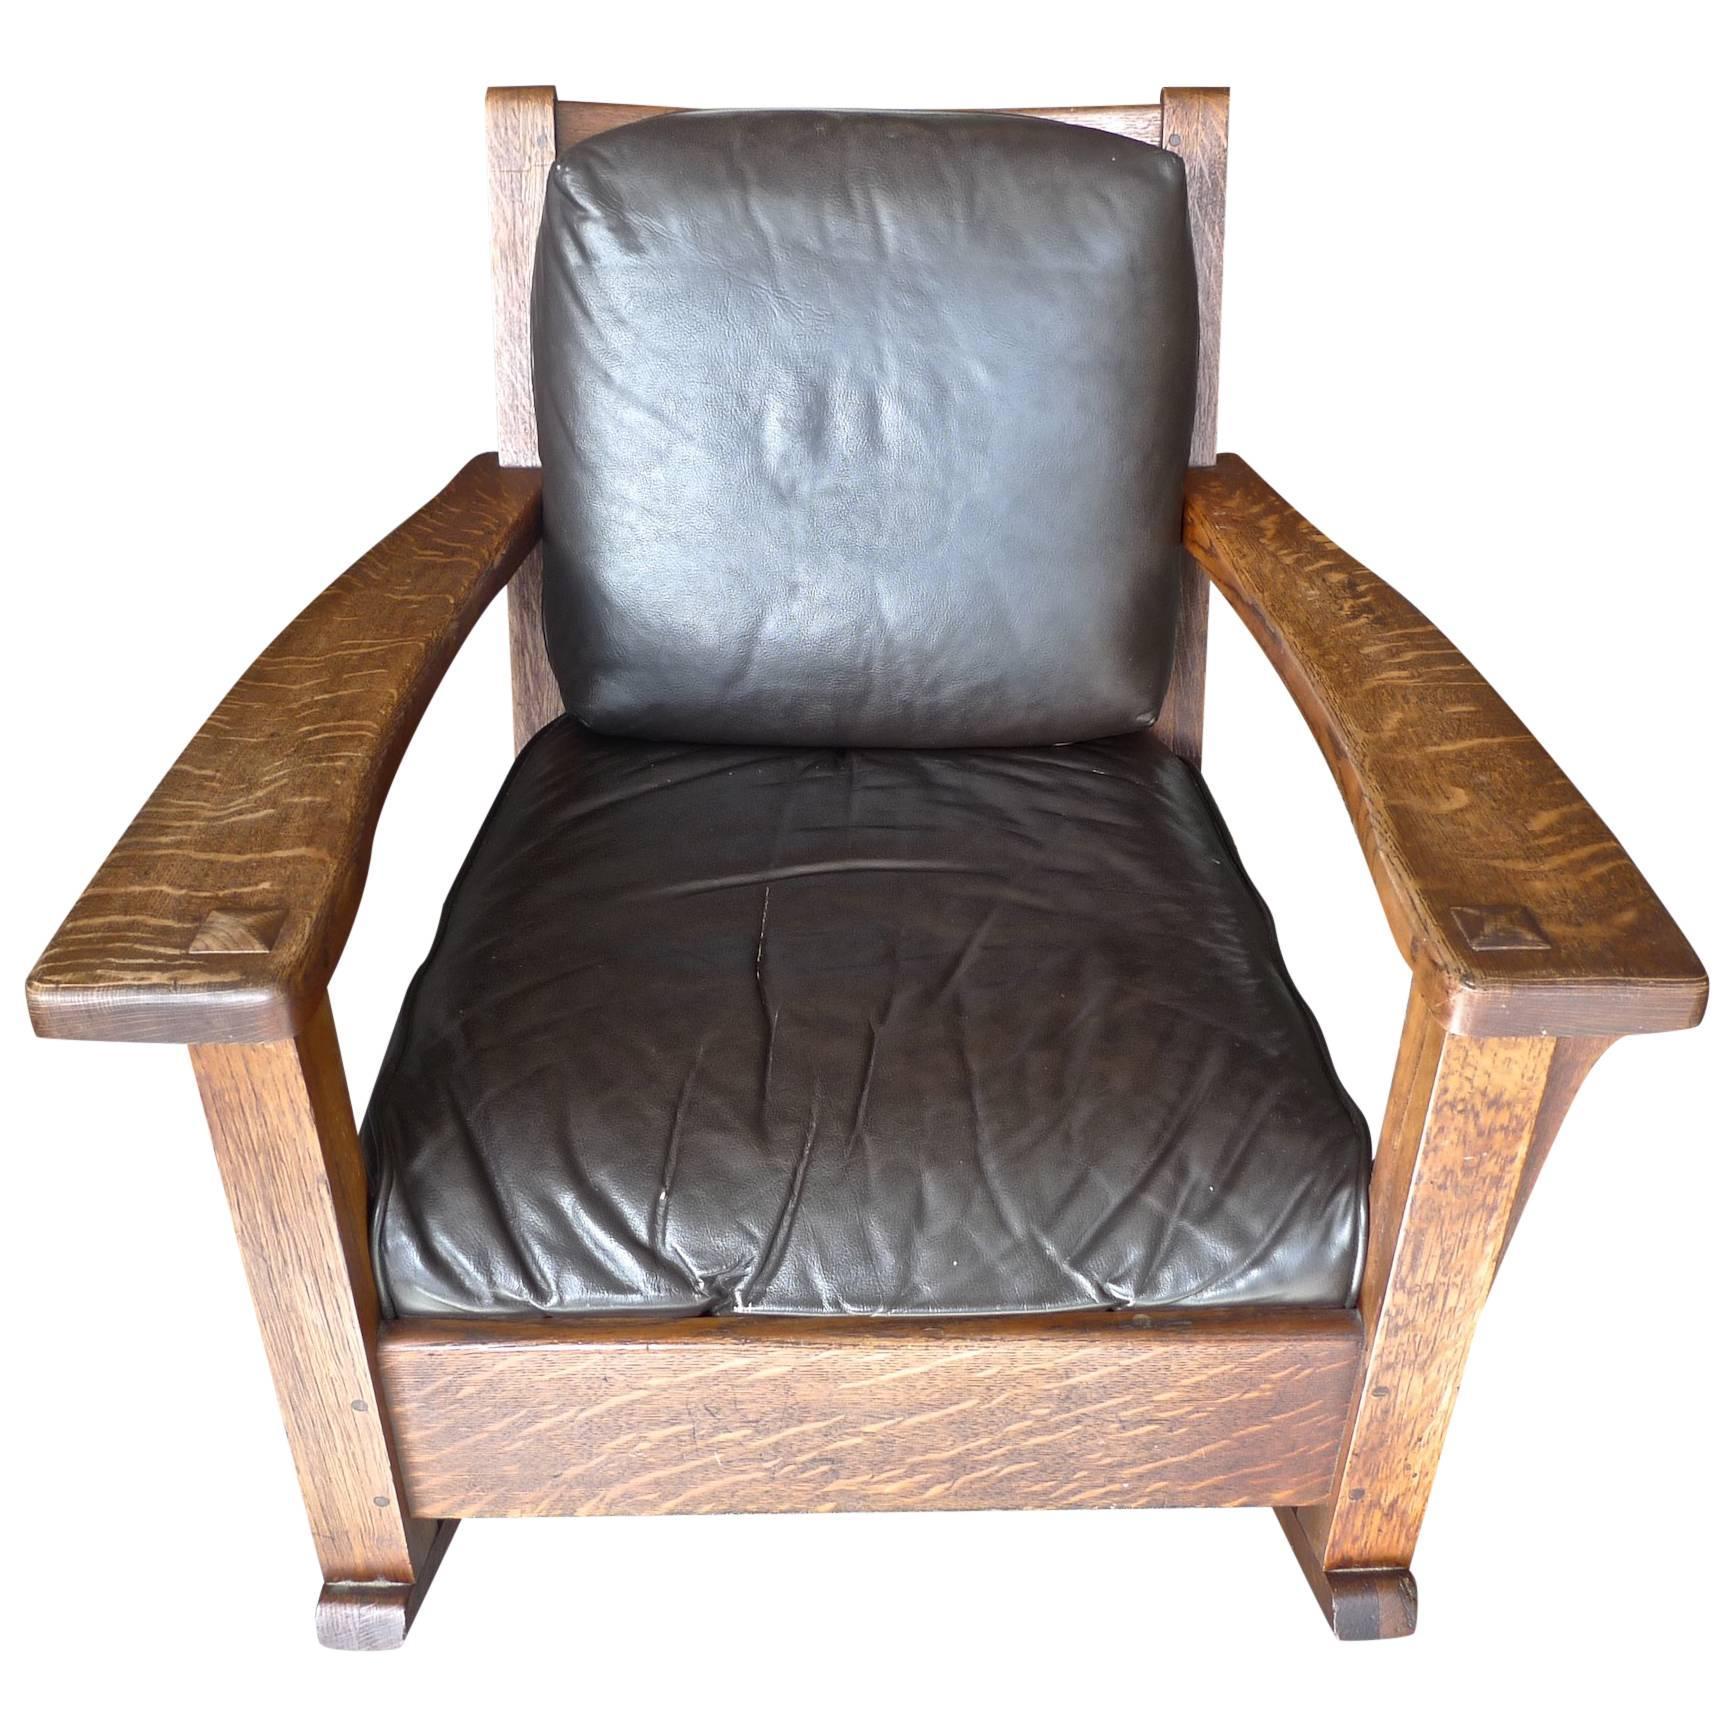 American Arts U0026 Crafts Mission Rocking Chair By Limberts U0026 2 Leather  Cushions.